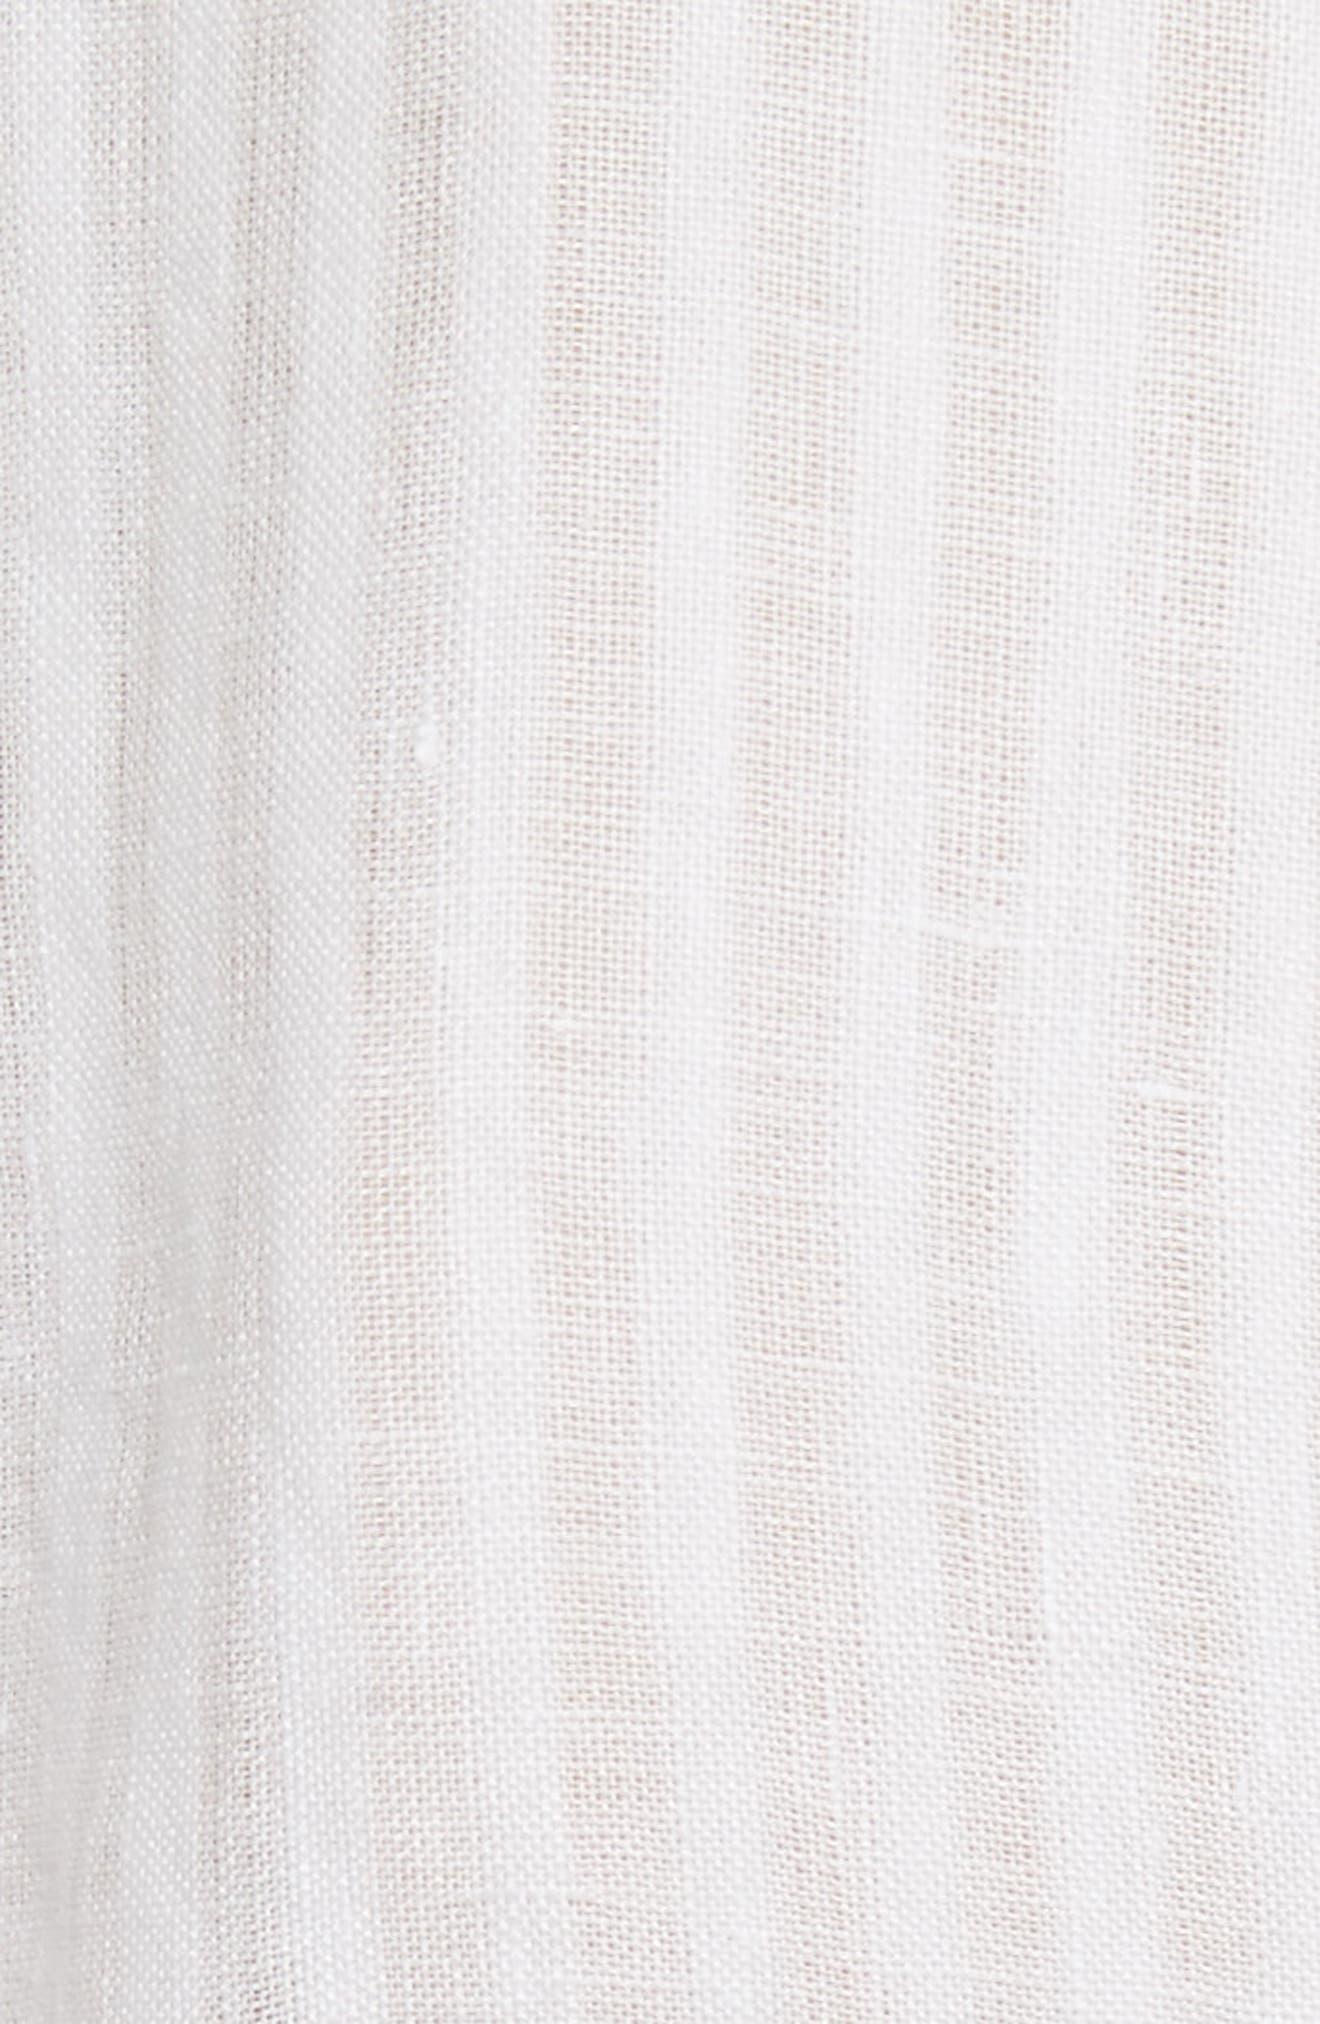 Belted Linen Dress,                             Alternate thumbnail 5, color,                             Blanc